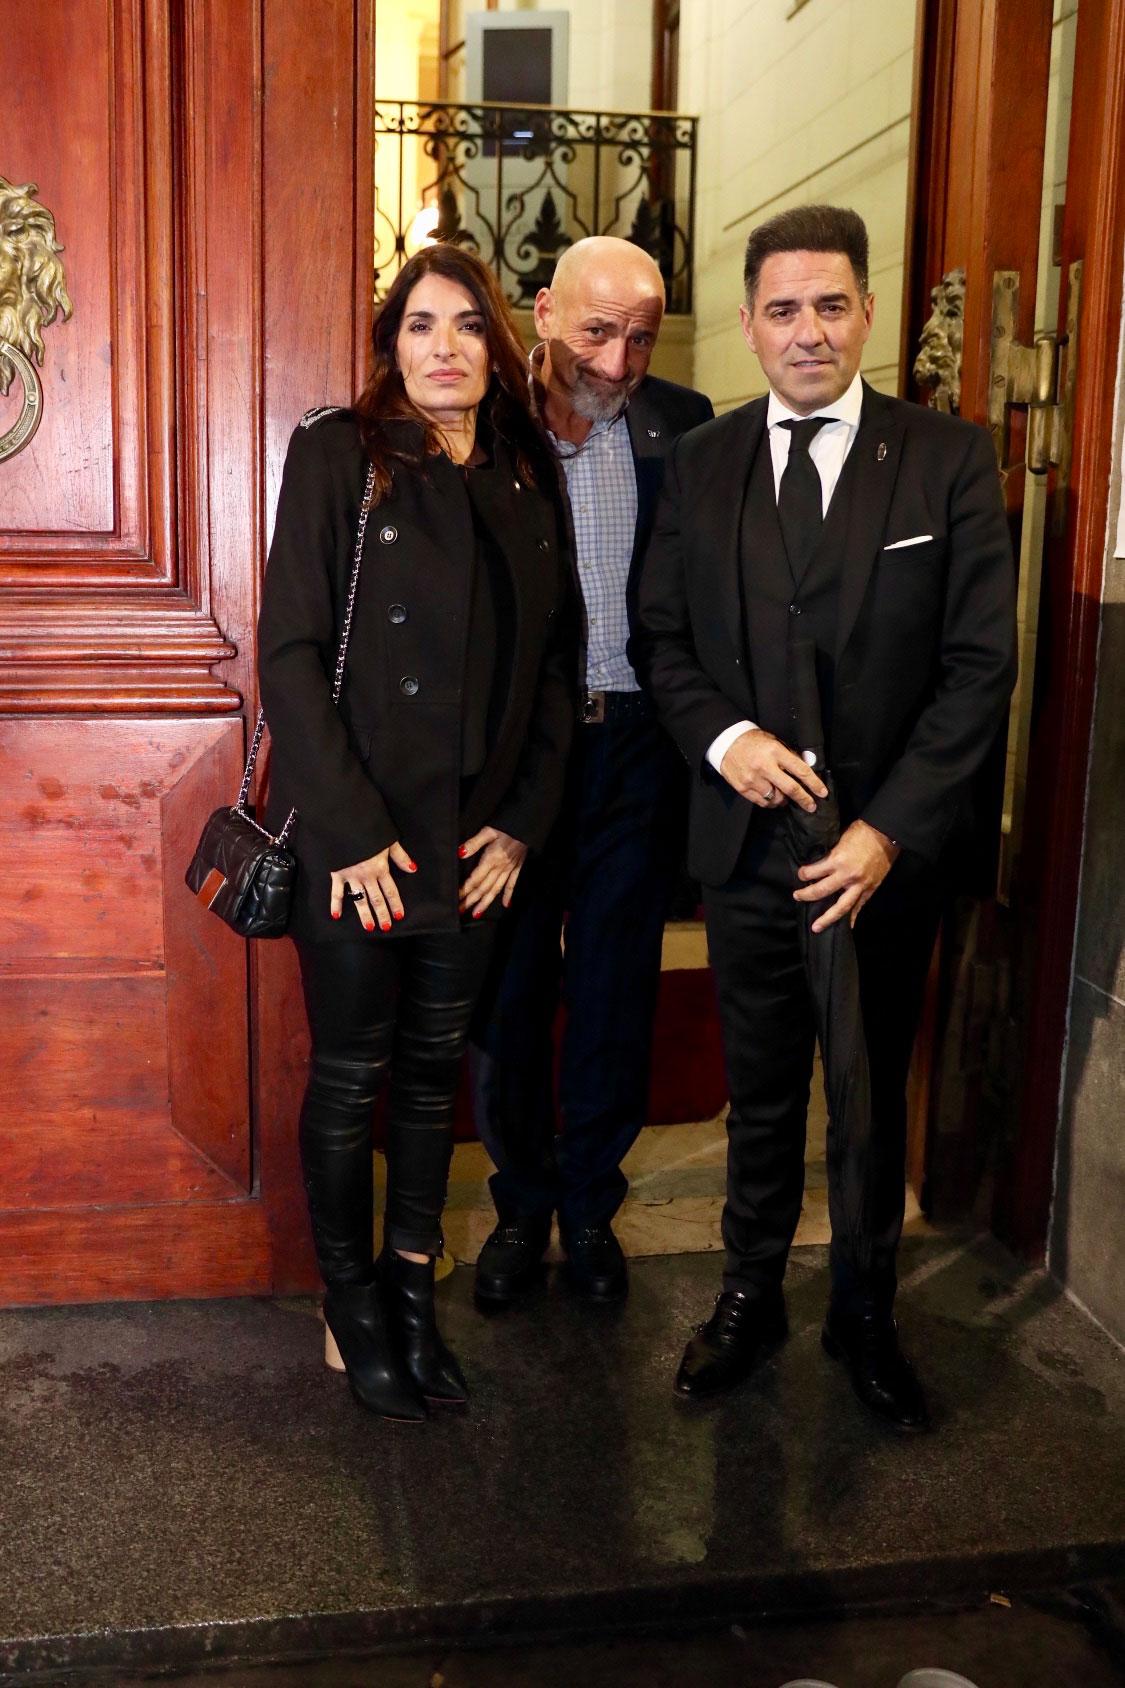 Romina Propato, Gustavo Sofovich y Mariano Iúdica (Foto: Teleshow/Chule Valerga)